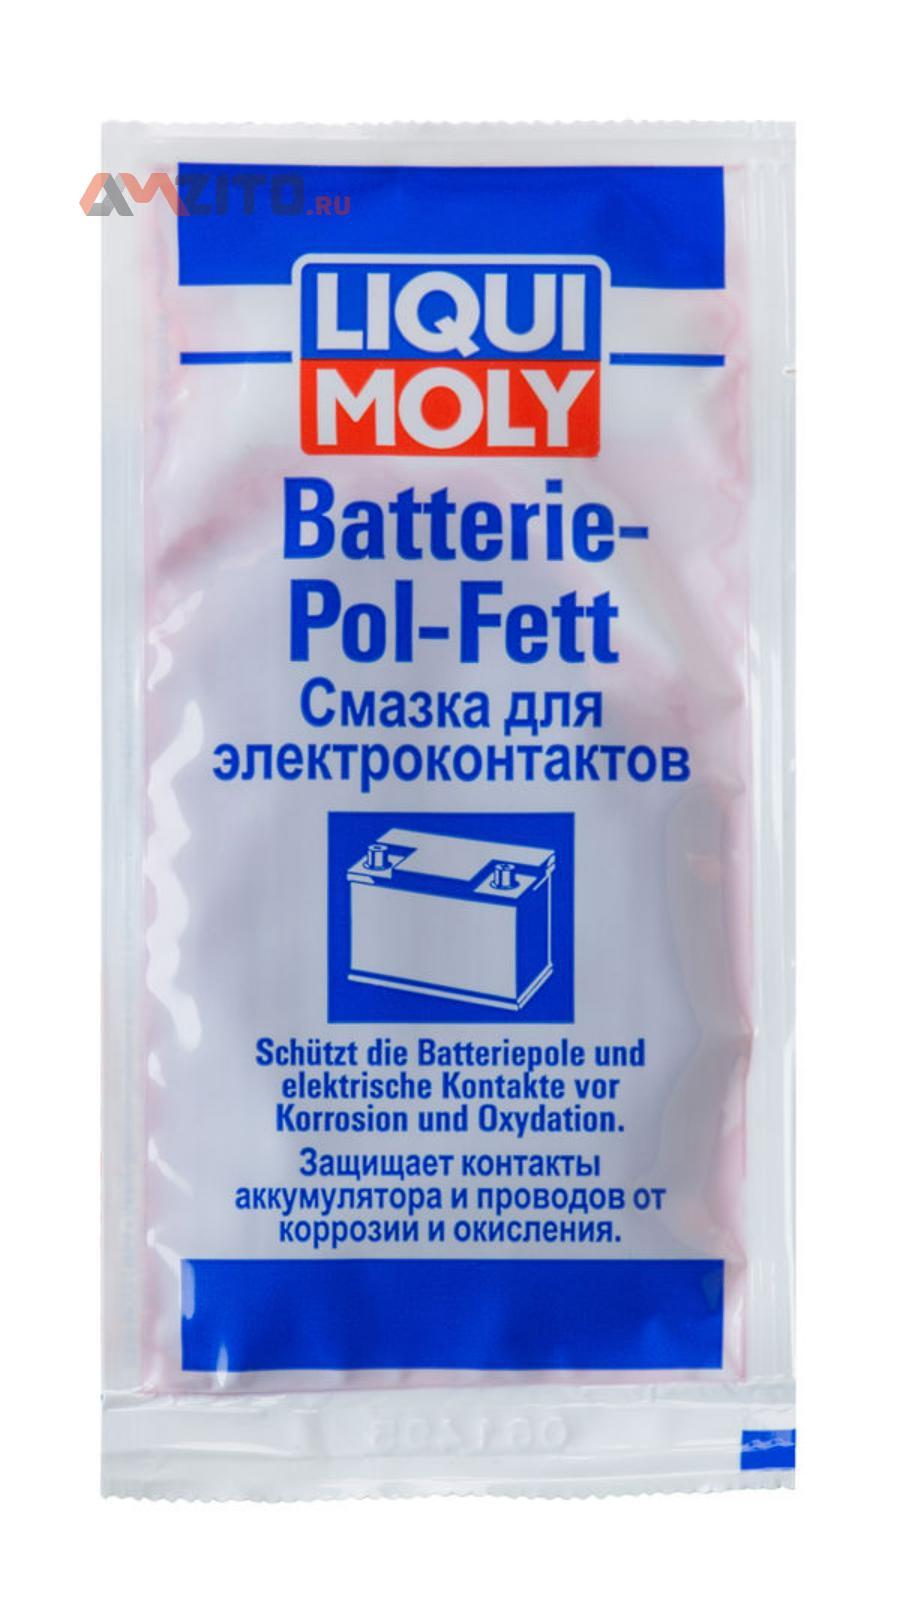 LiquiMoly Batterie-Pol-Fett 0.01KG смазка для электроконтактов